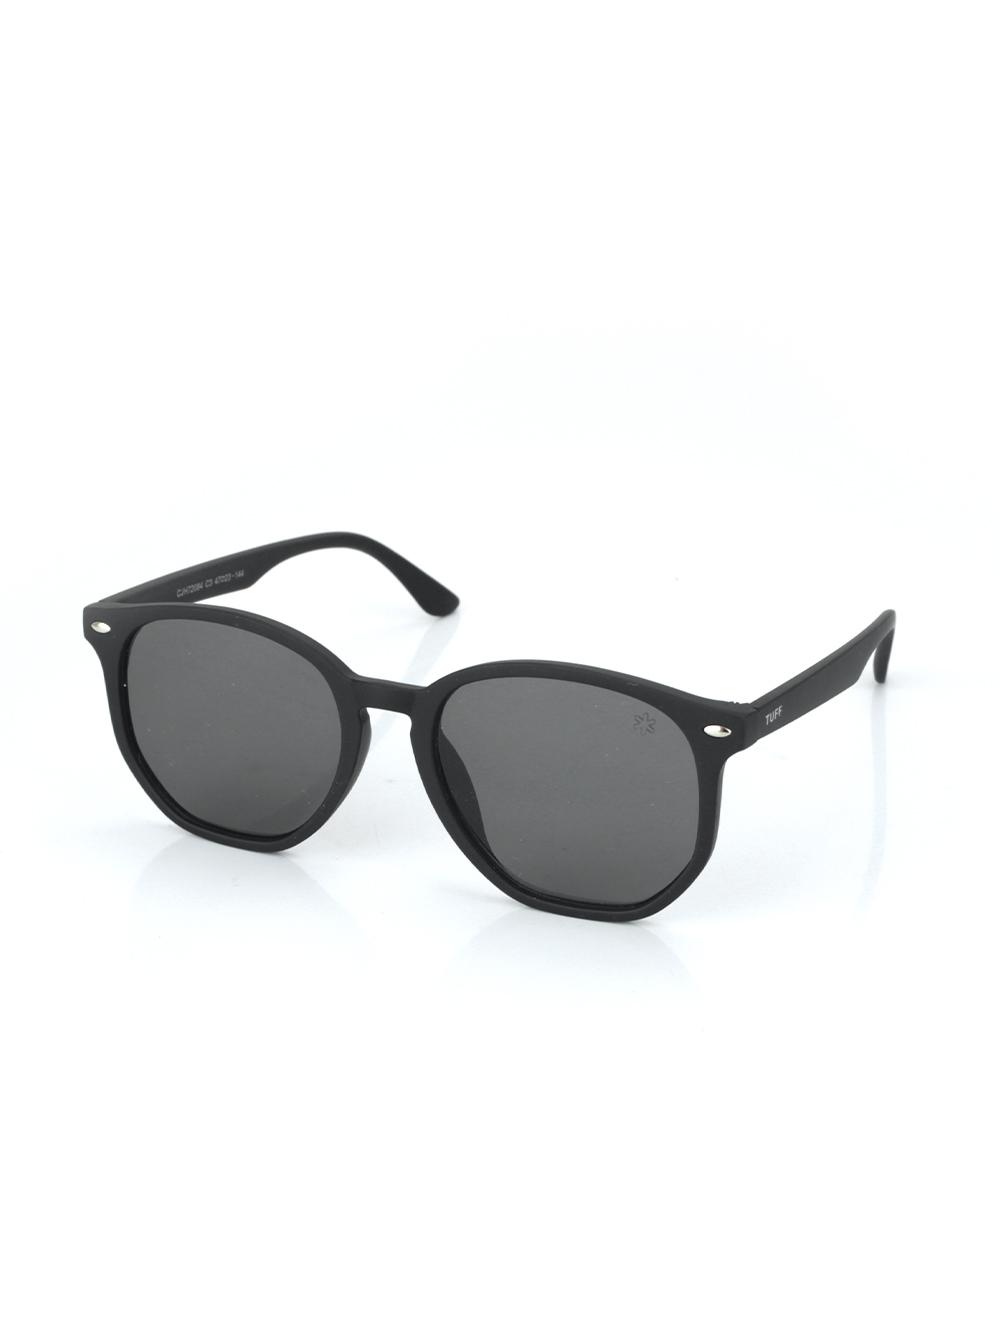 Sunglasses Hexagonal Preto